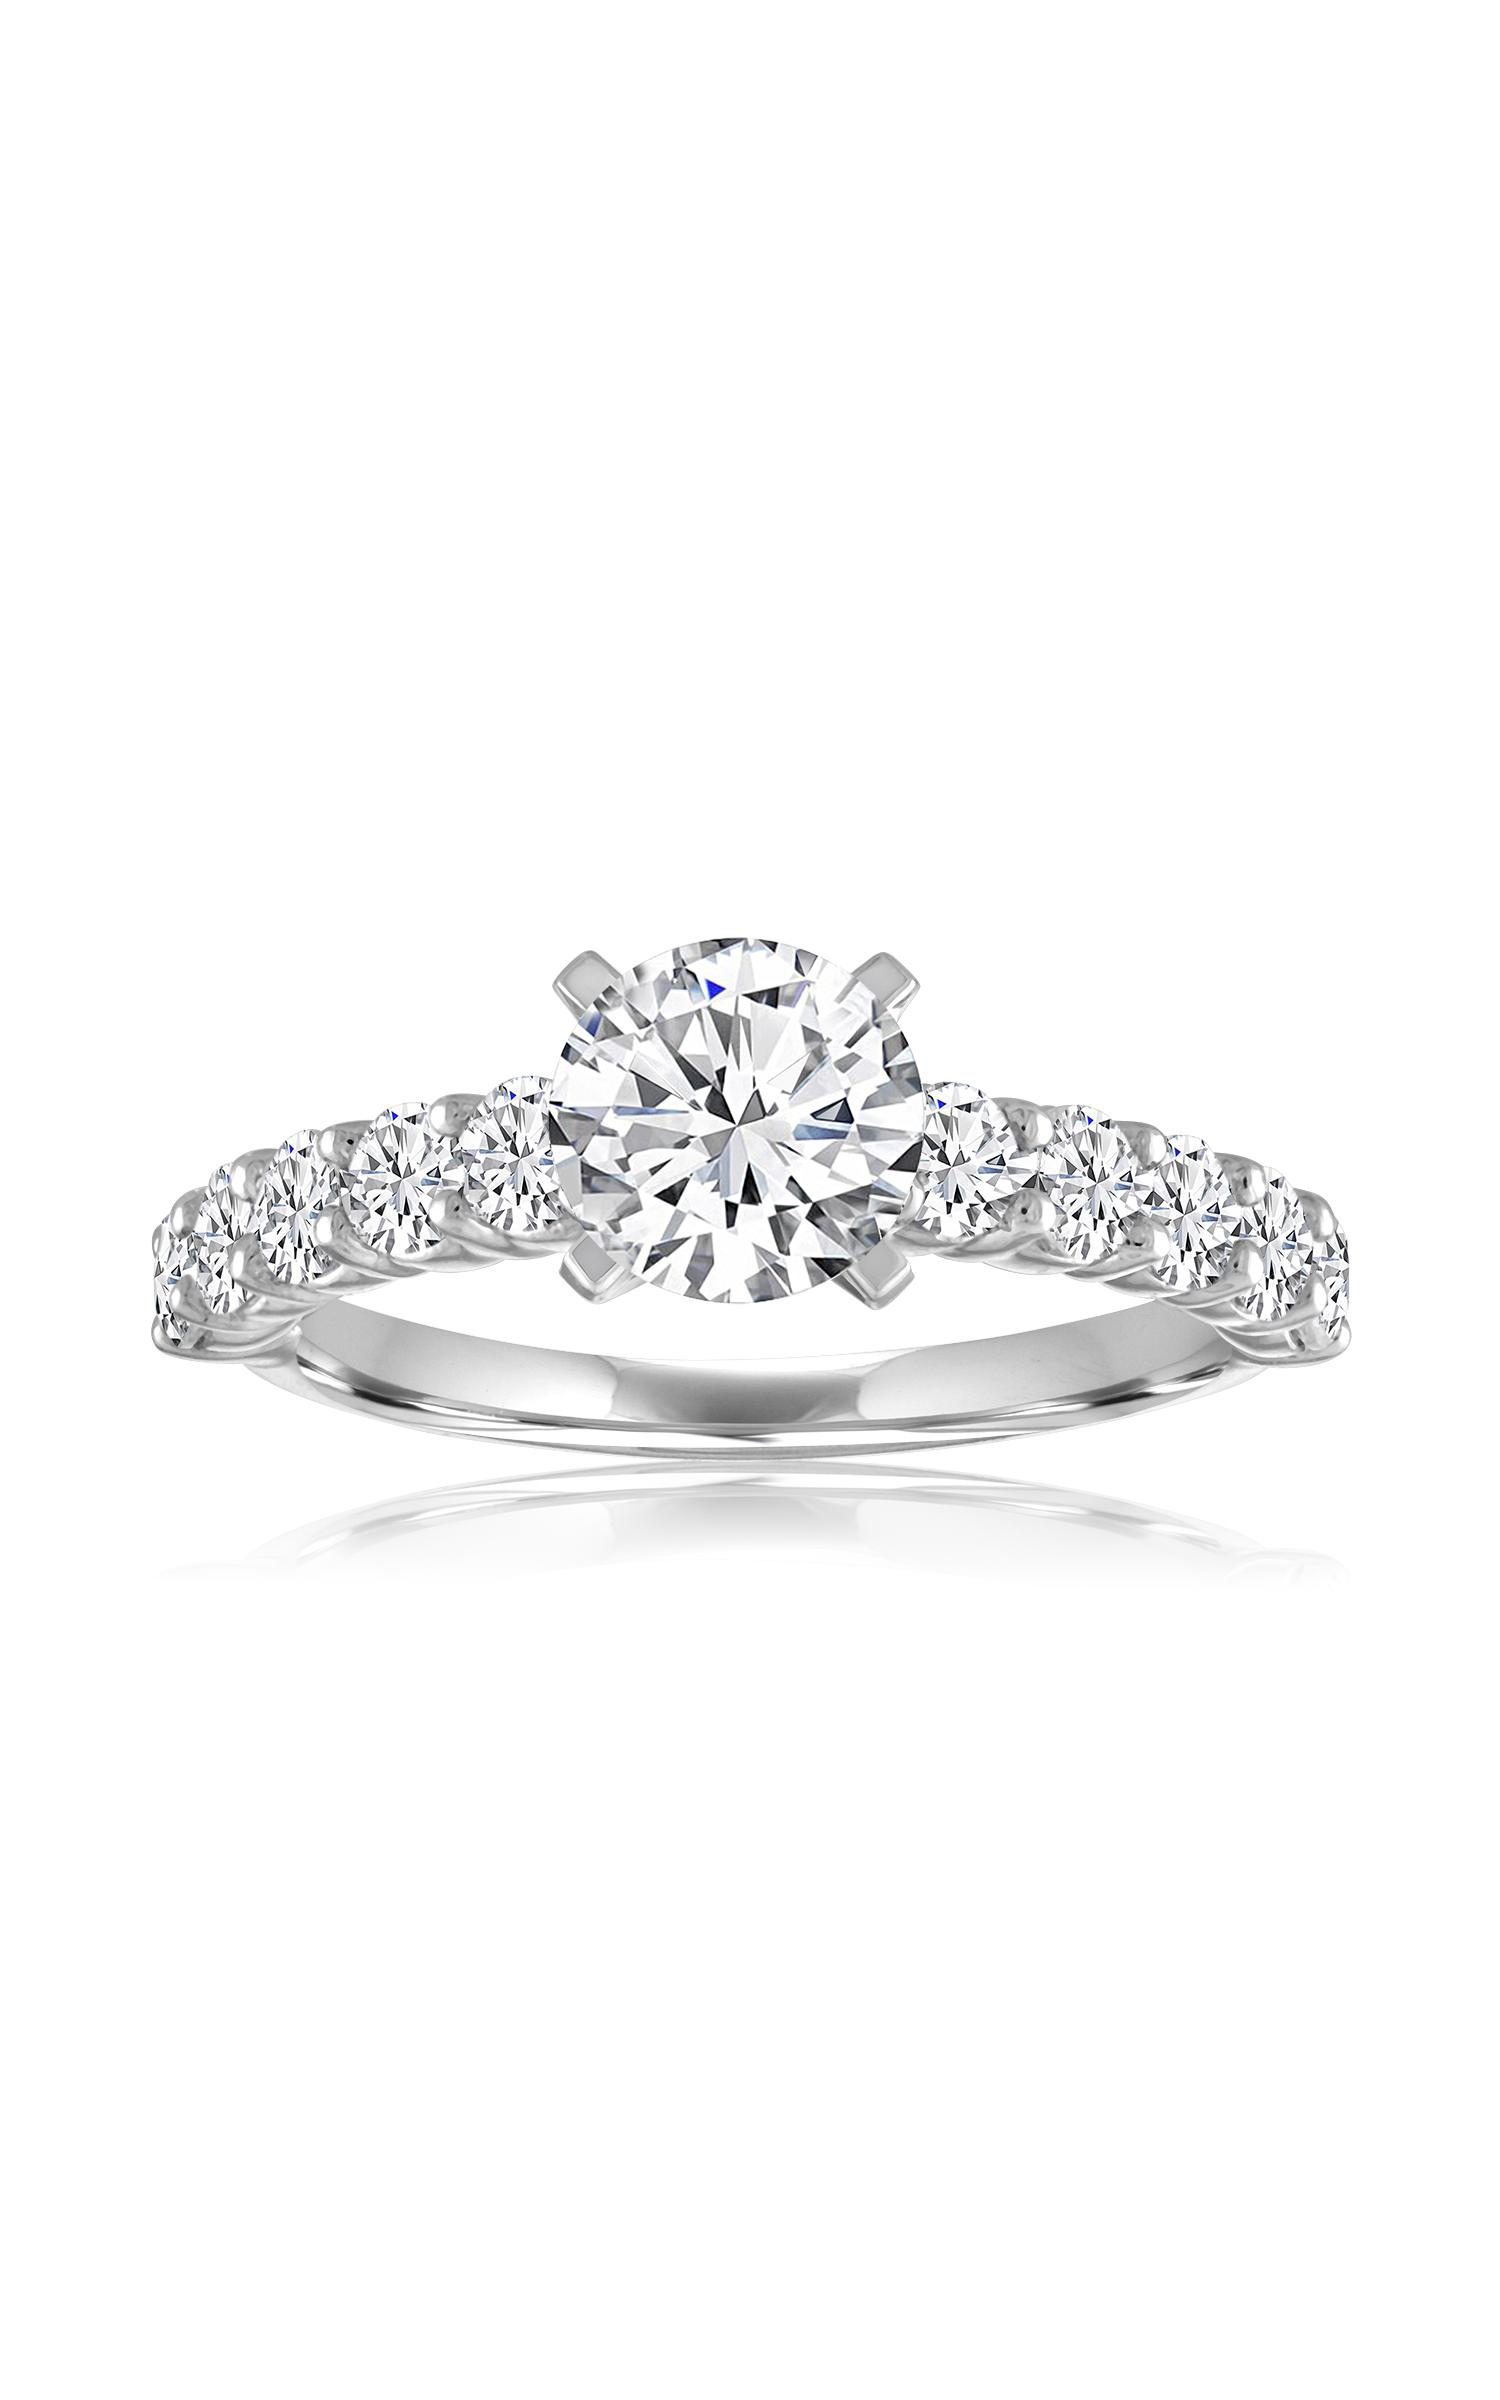 Imagine Bridal Engagement Rings 66111D-1 2 product image